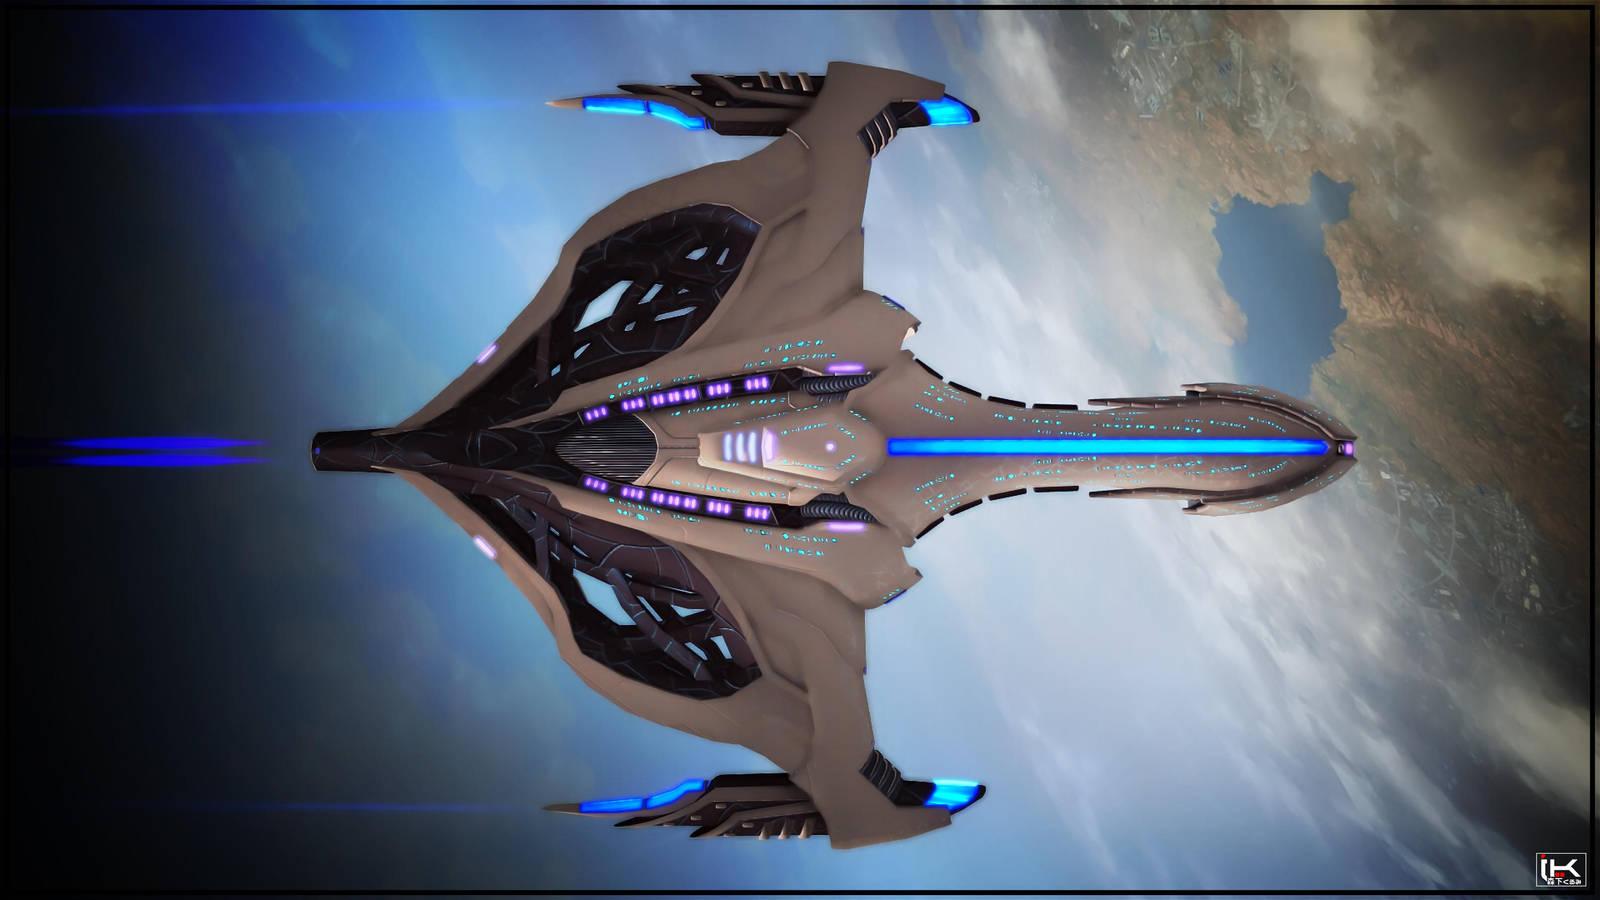 aves_dyson_science_destroyer_by_kurumi_morishita_daozpyk-fullview.jpg